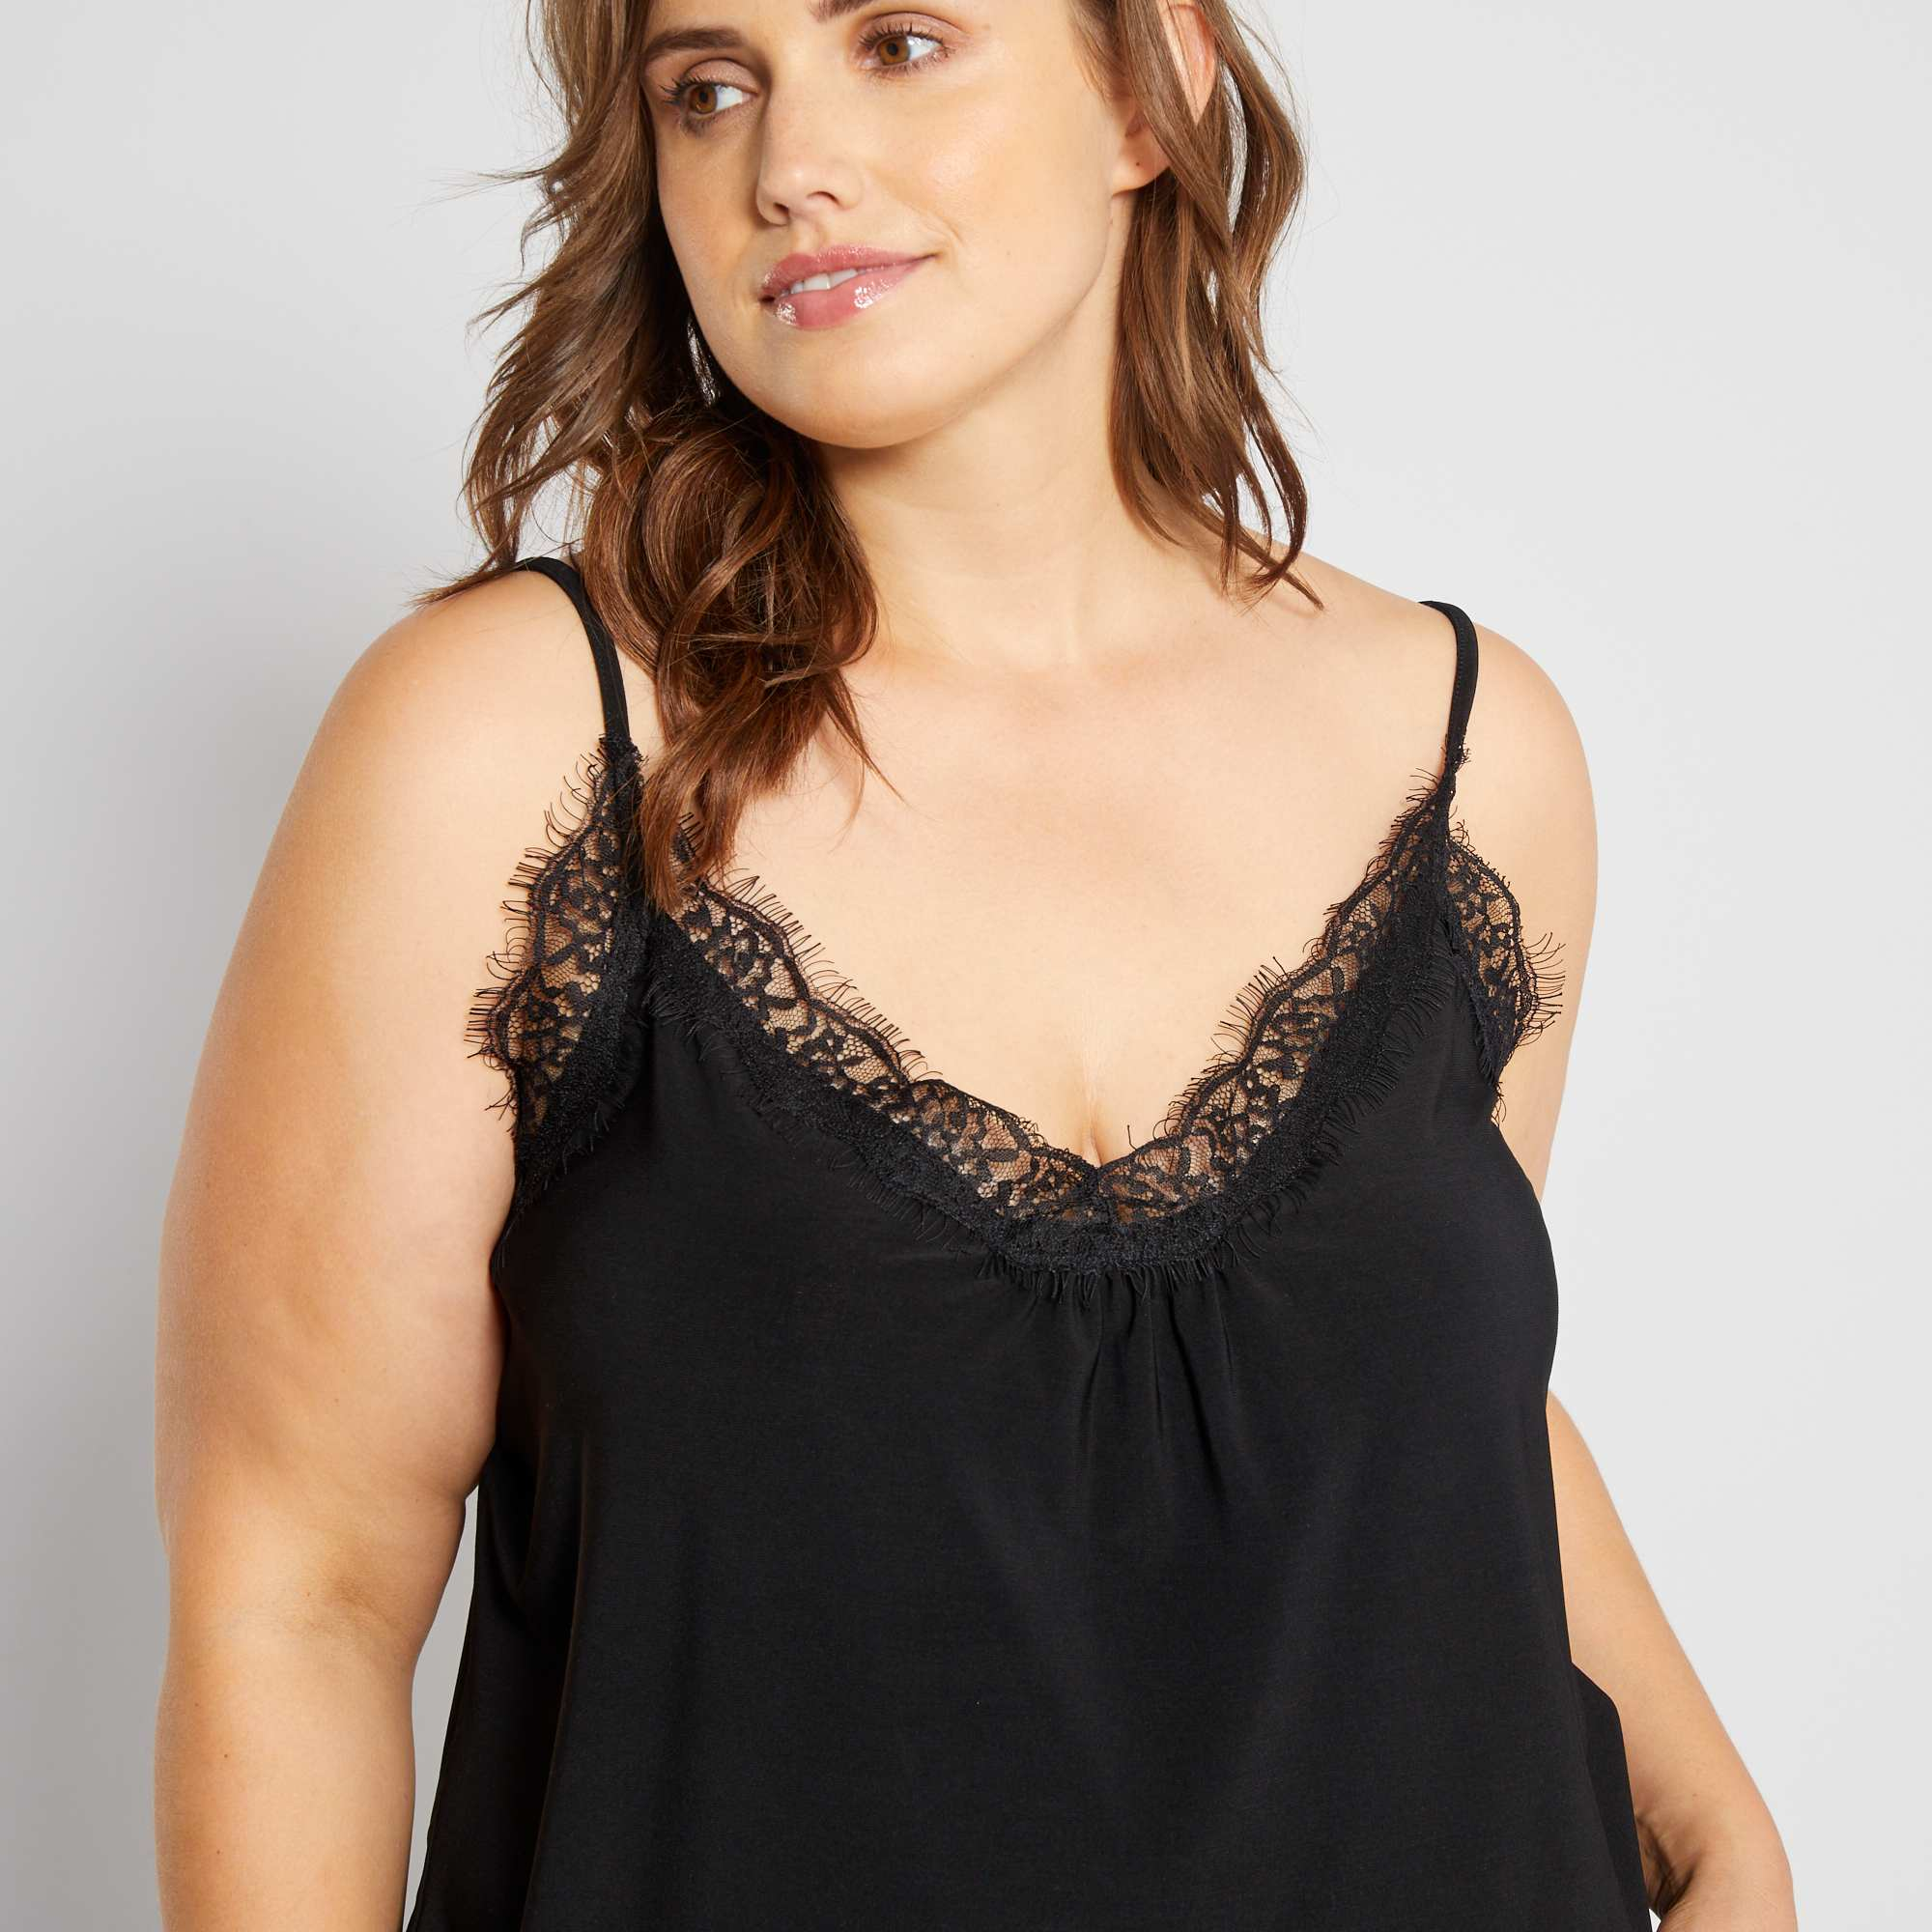 e94442265a Top nuisette avec dentelle Grande taille femme - noir - Kiabi - 15,00€